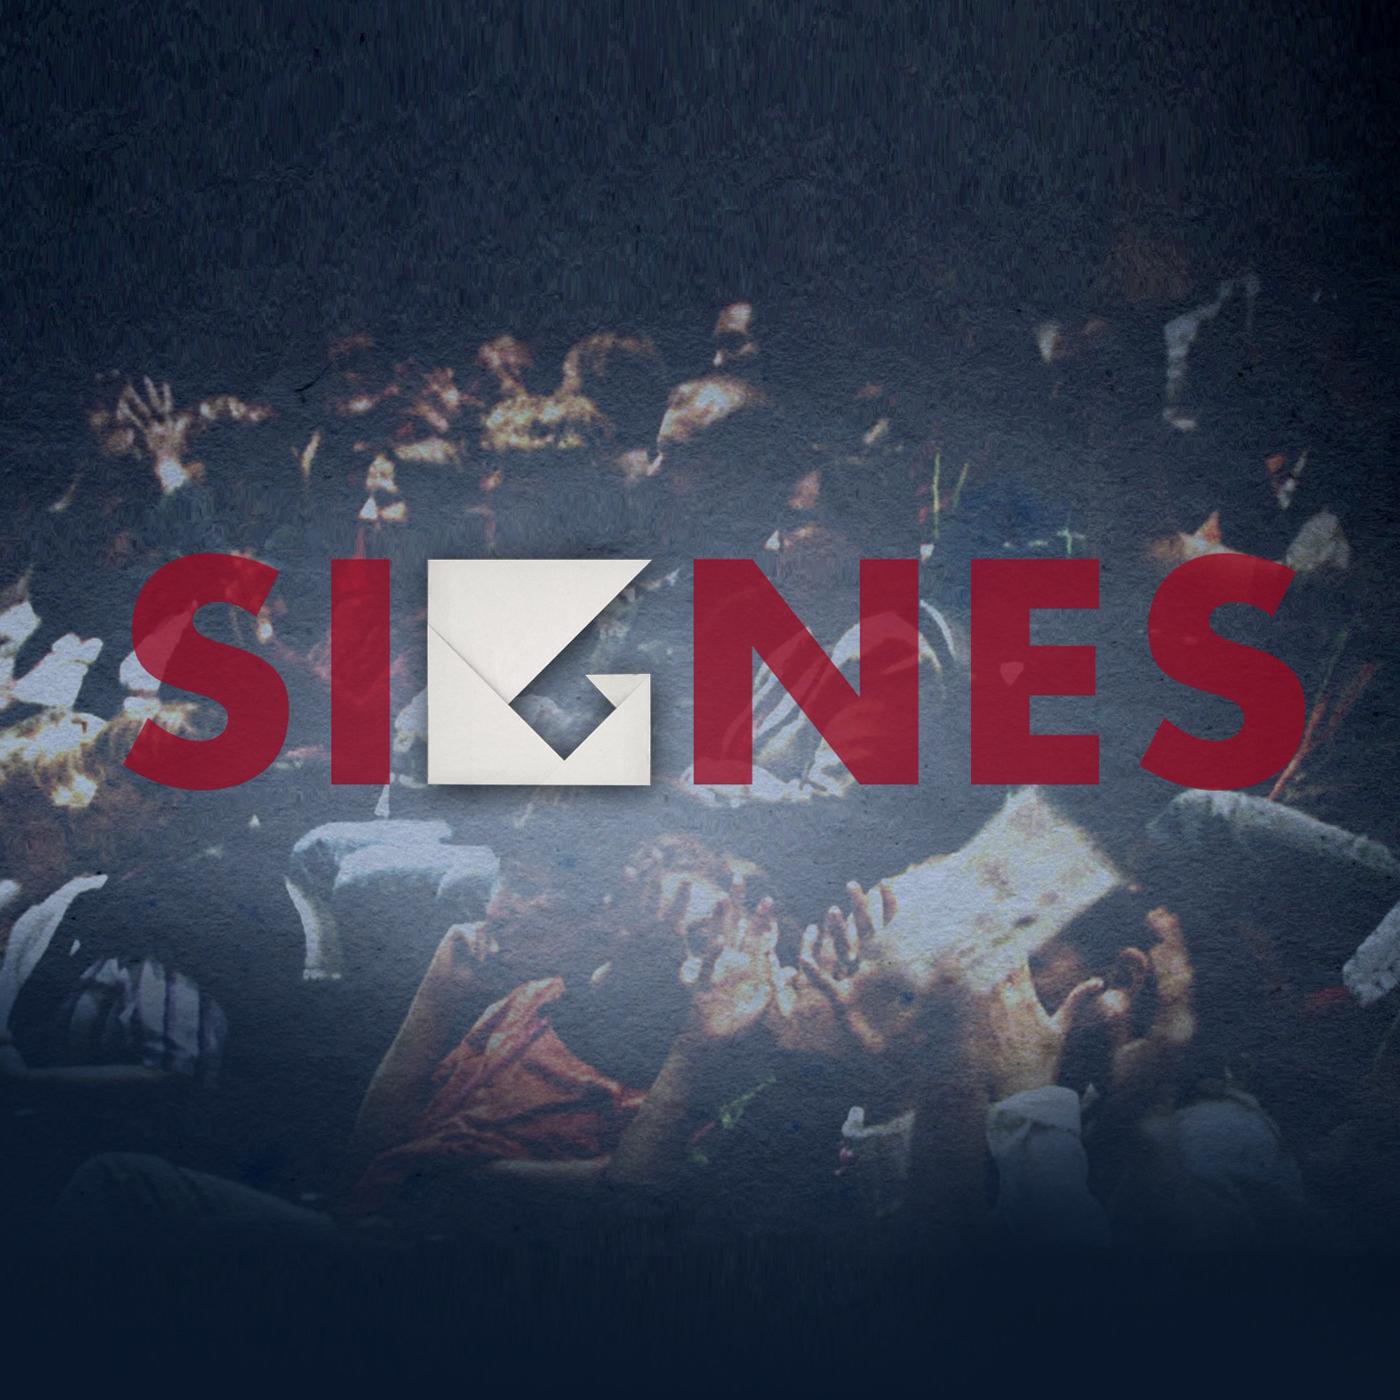 Signes podcast logo [RTS]